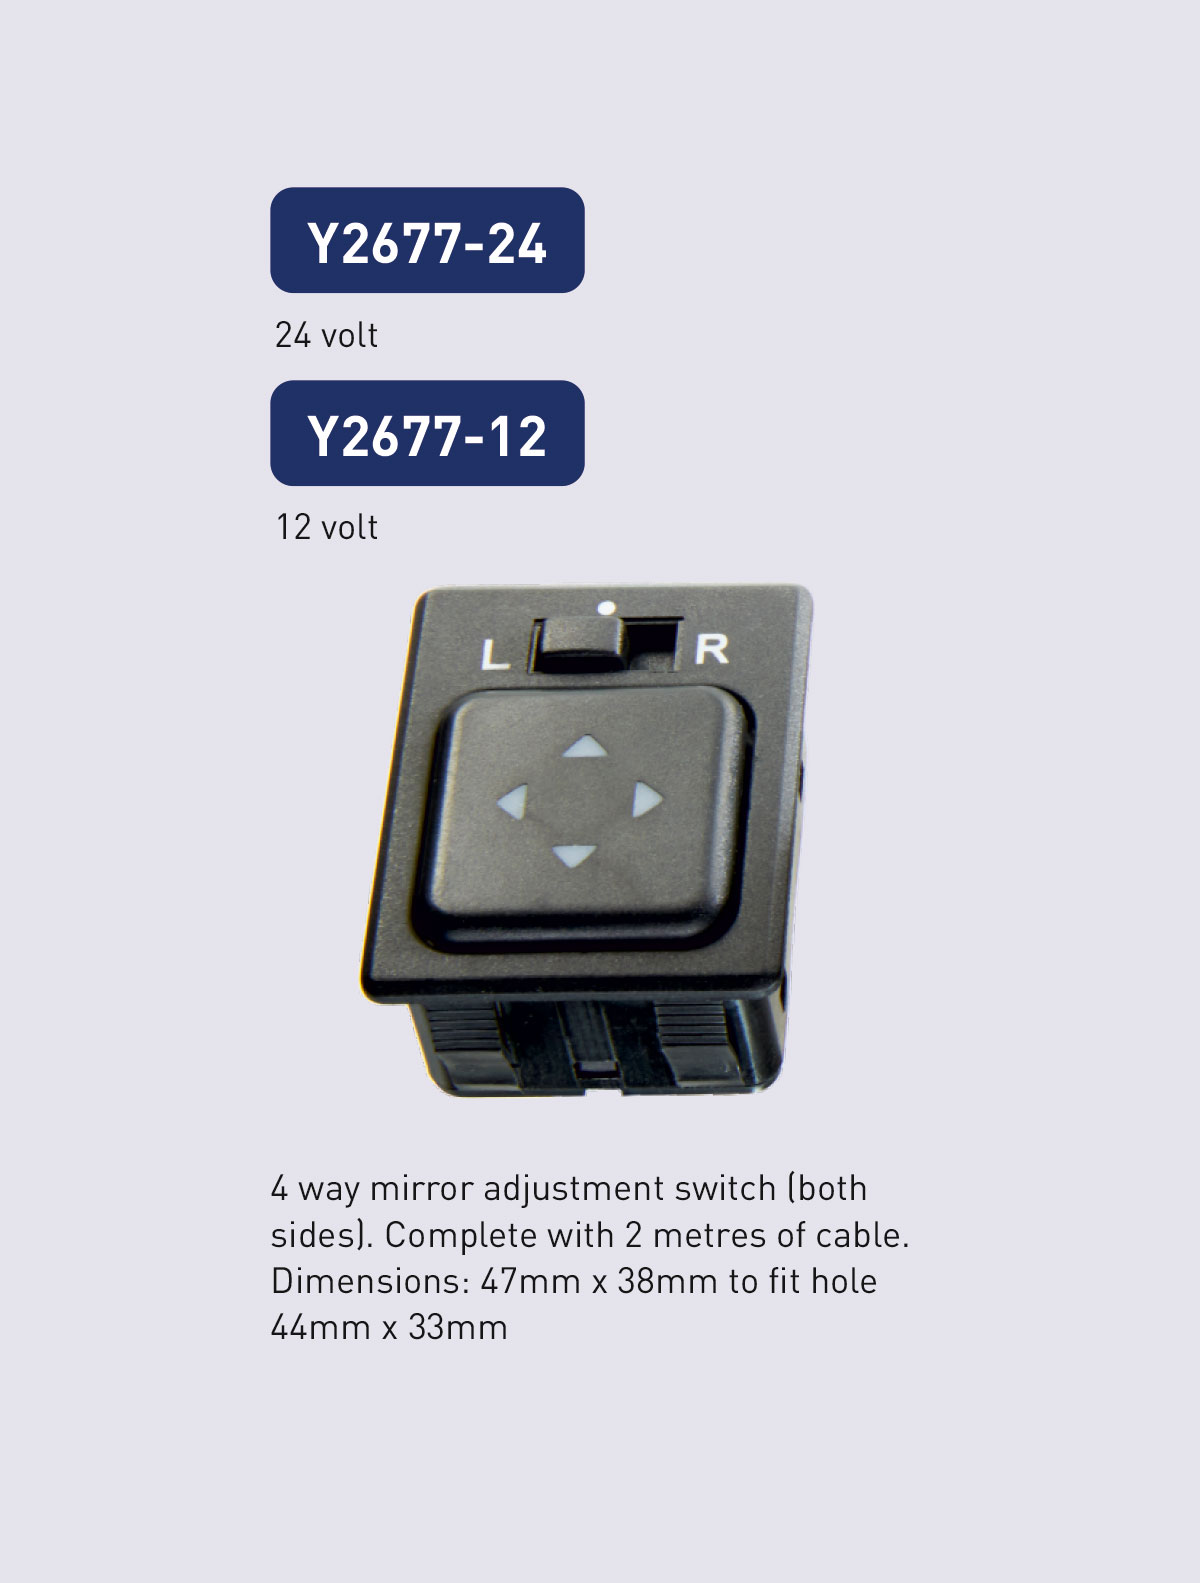 Y2677 power button